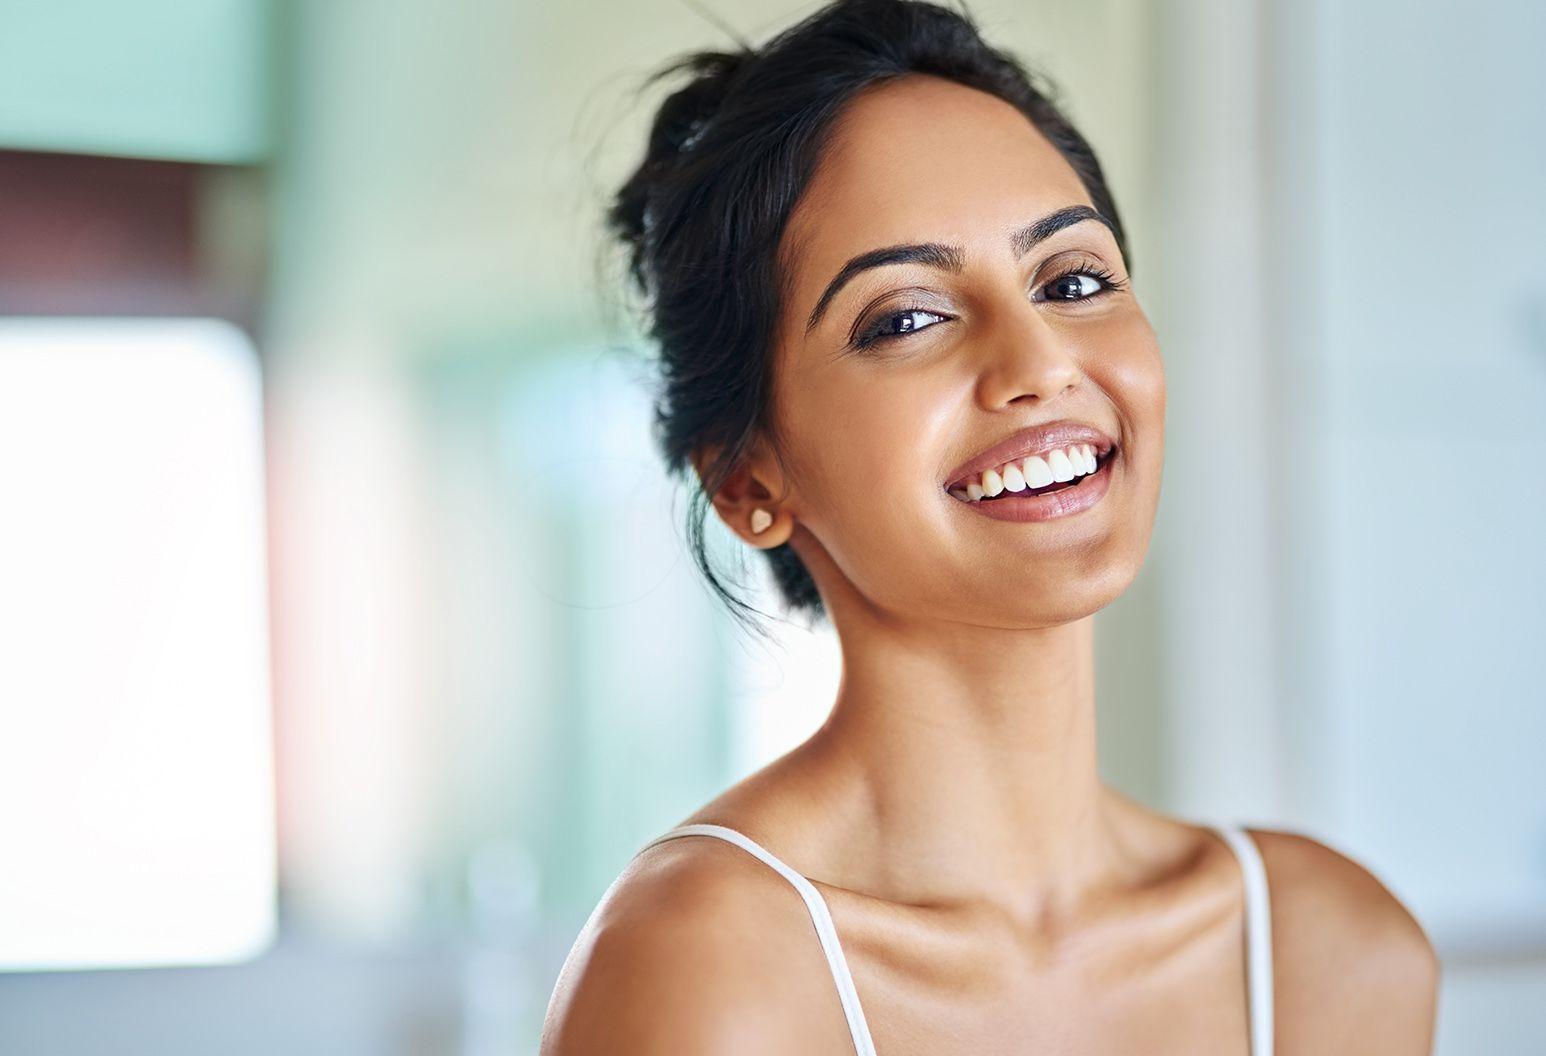 Beautiful woman looking at the camera smiling